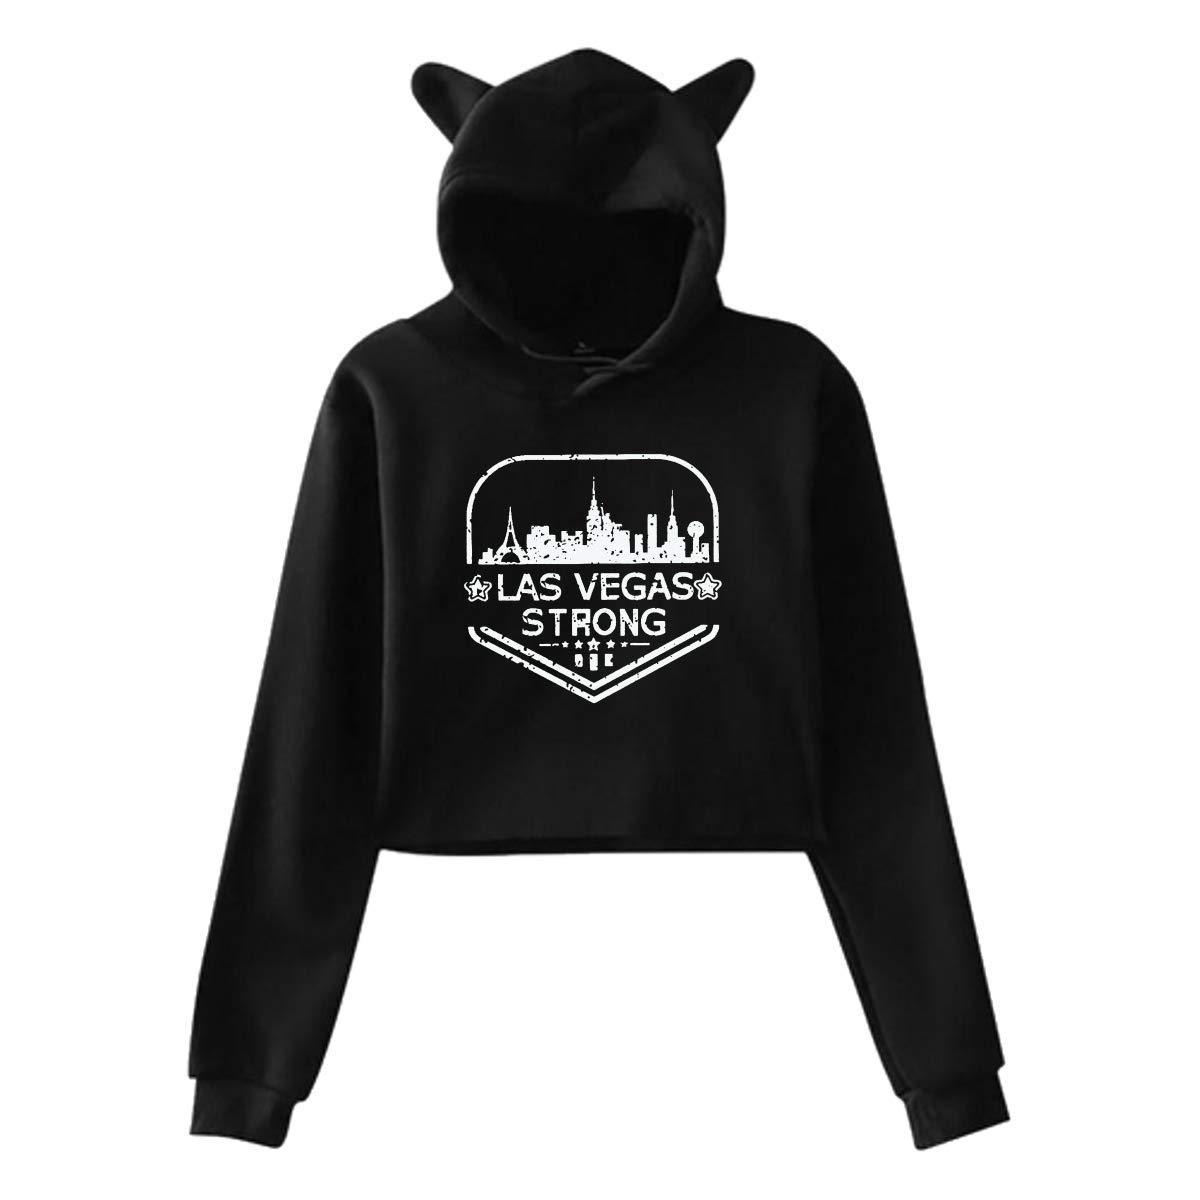 Las Vegas Strong Heartbeat,Cat Ear Hoodie Sweatshirts,Midriff-Baring Hoody Sweater Womens Sexy Stylish Hoodie Sweater Girls Cute Hoodies